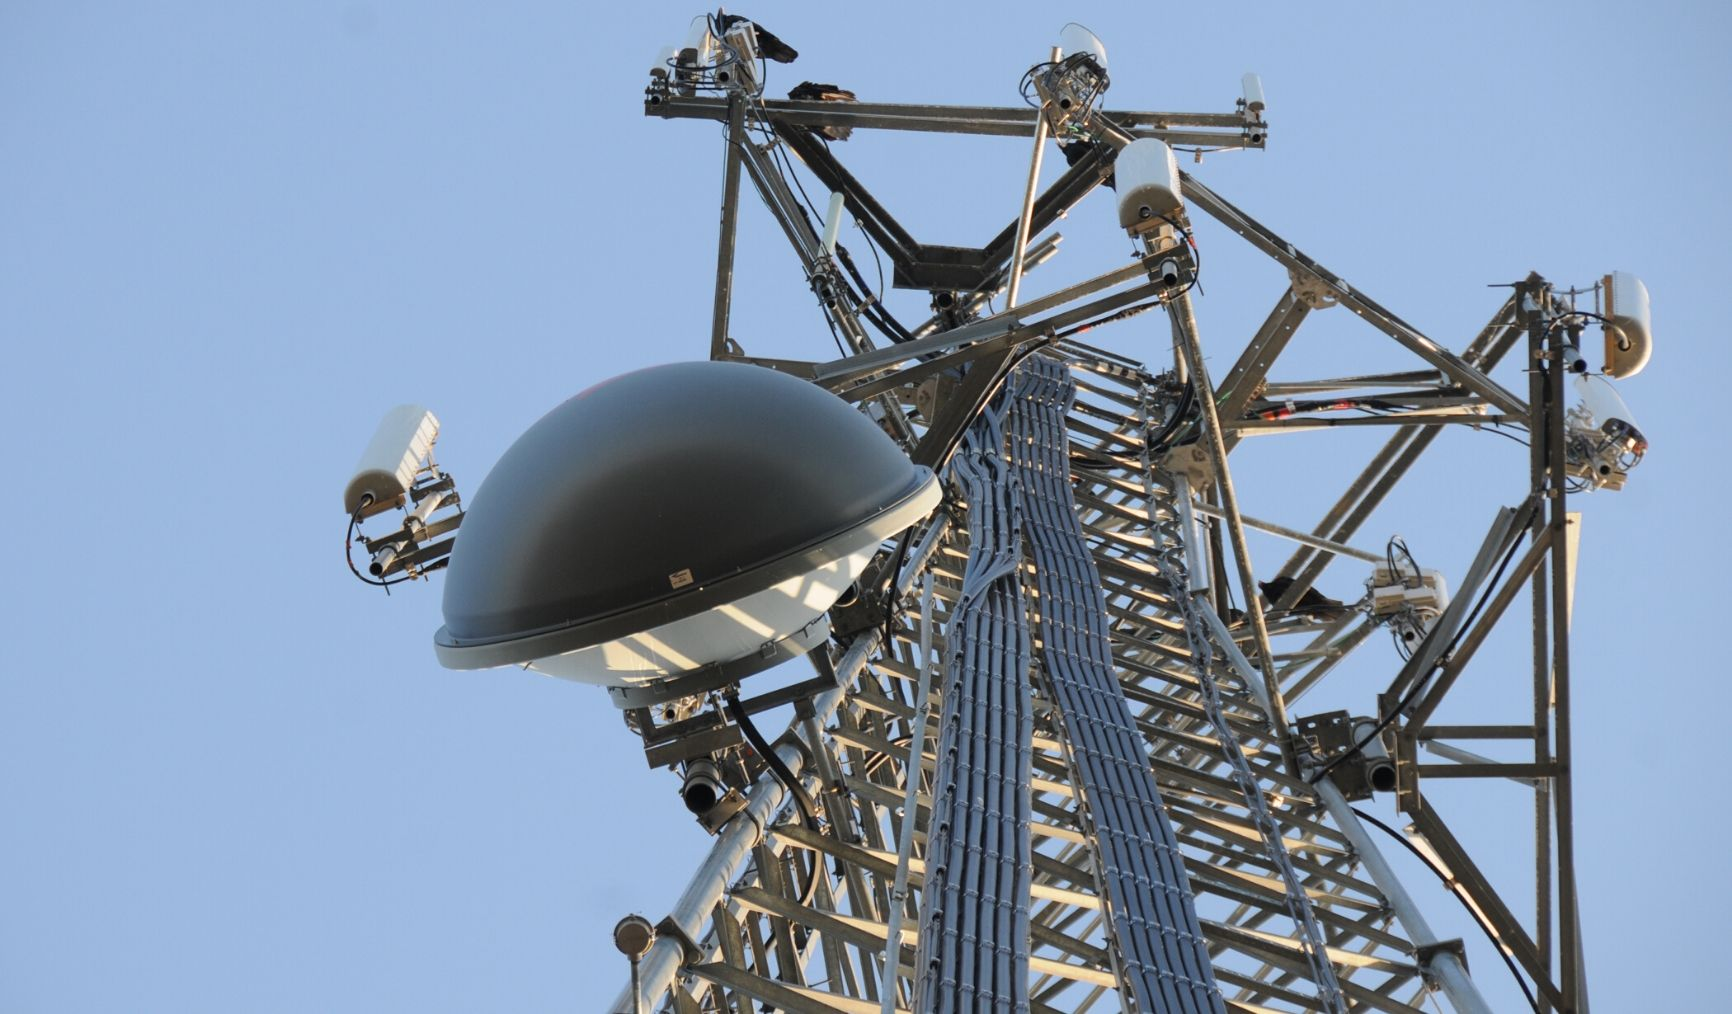 The new broadband plan and Nigeria's digital future